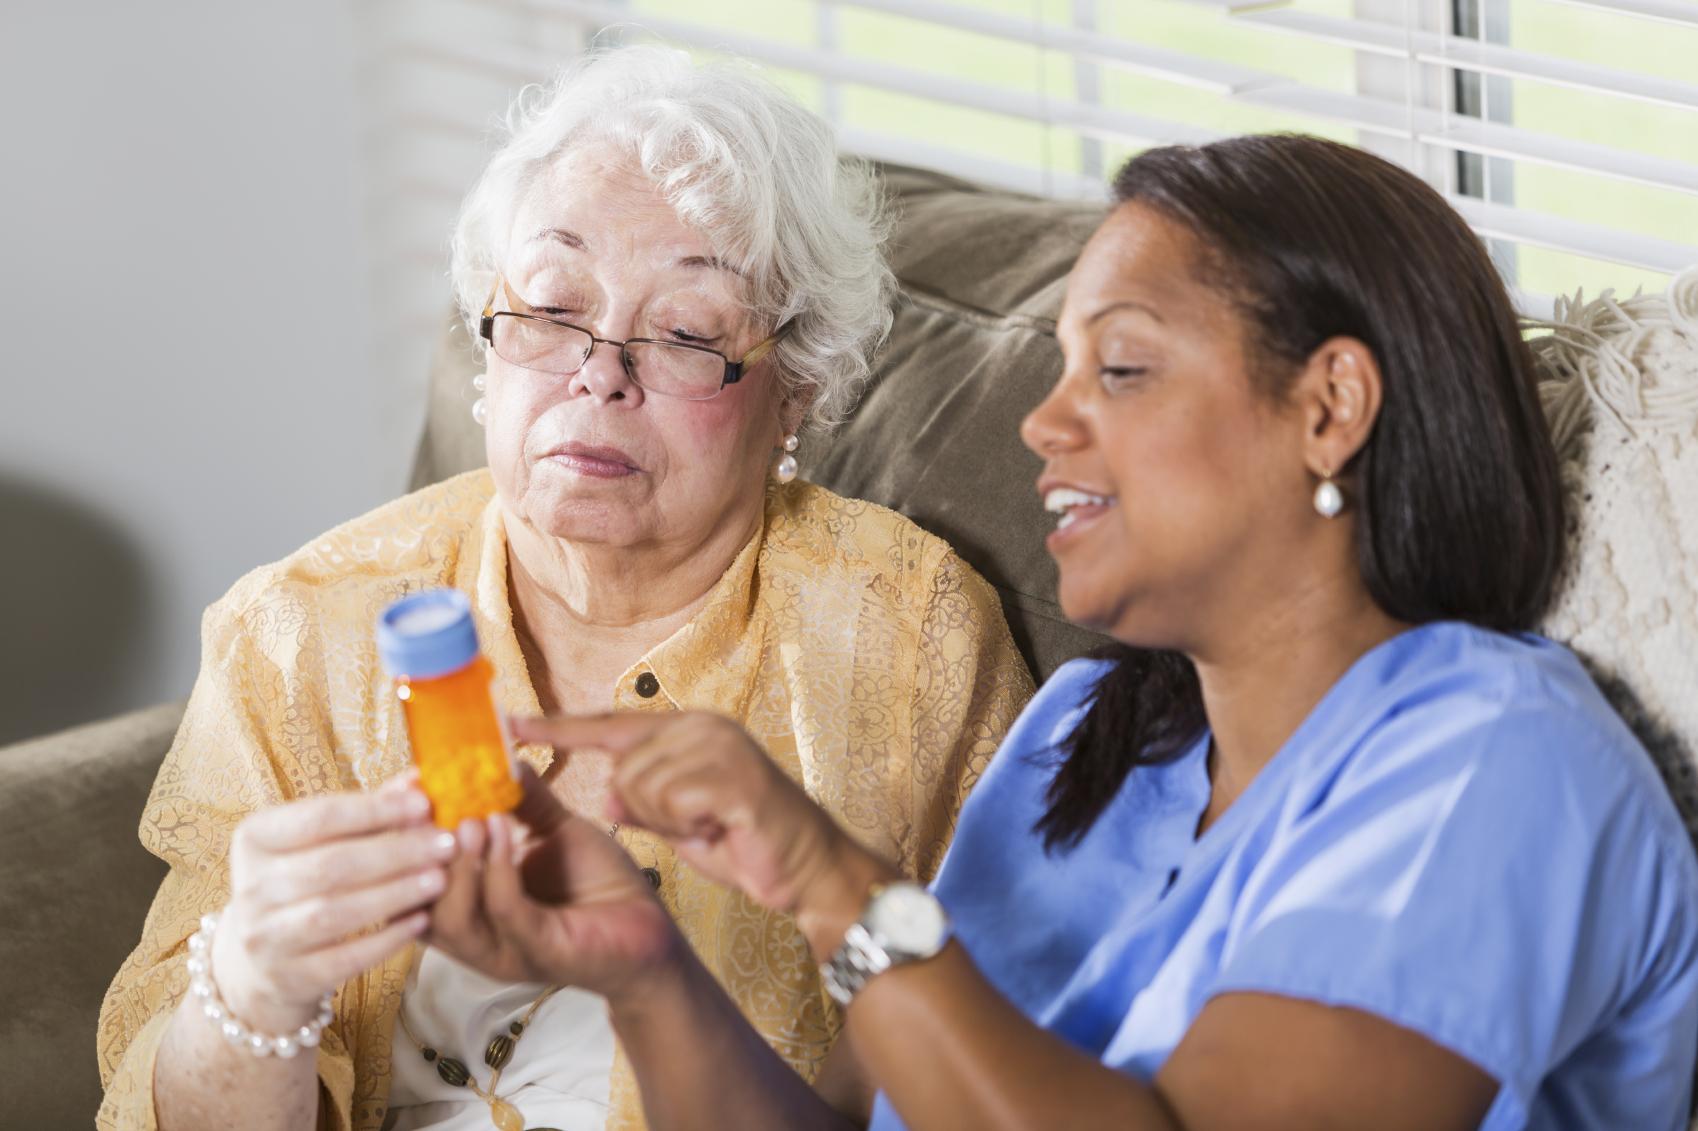 mlmsi_dallas_home_health_care_hospice_nurse.jpg